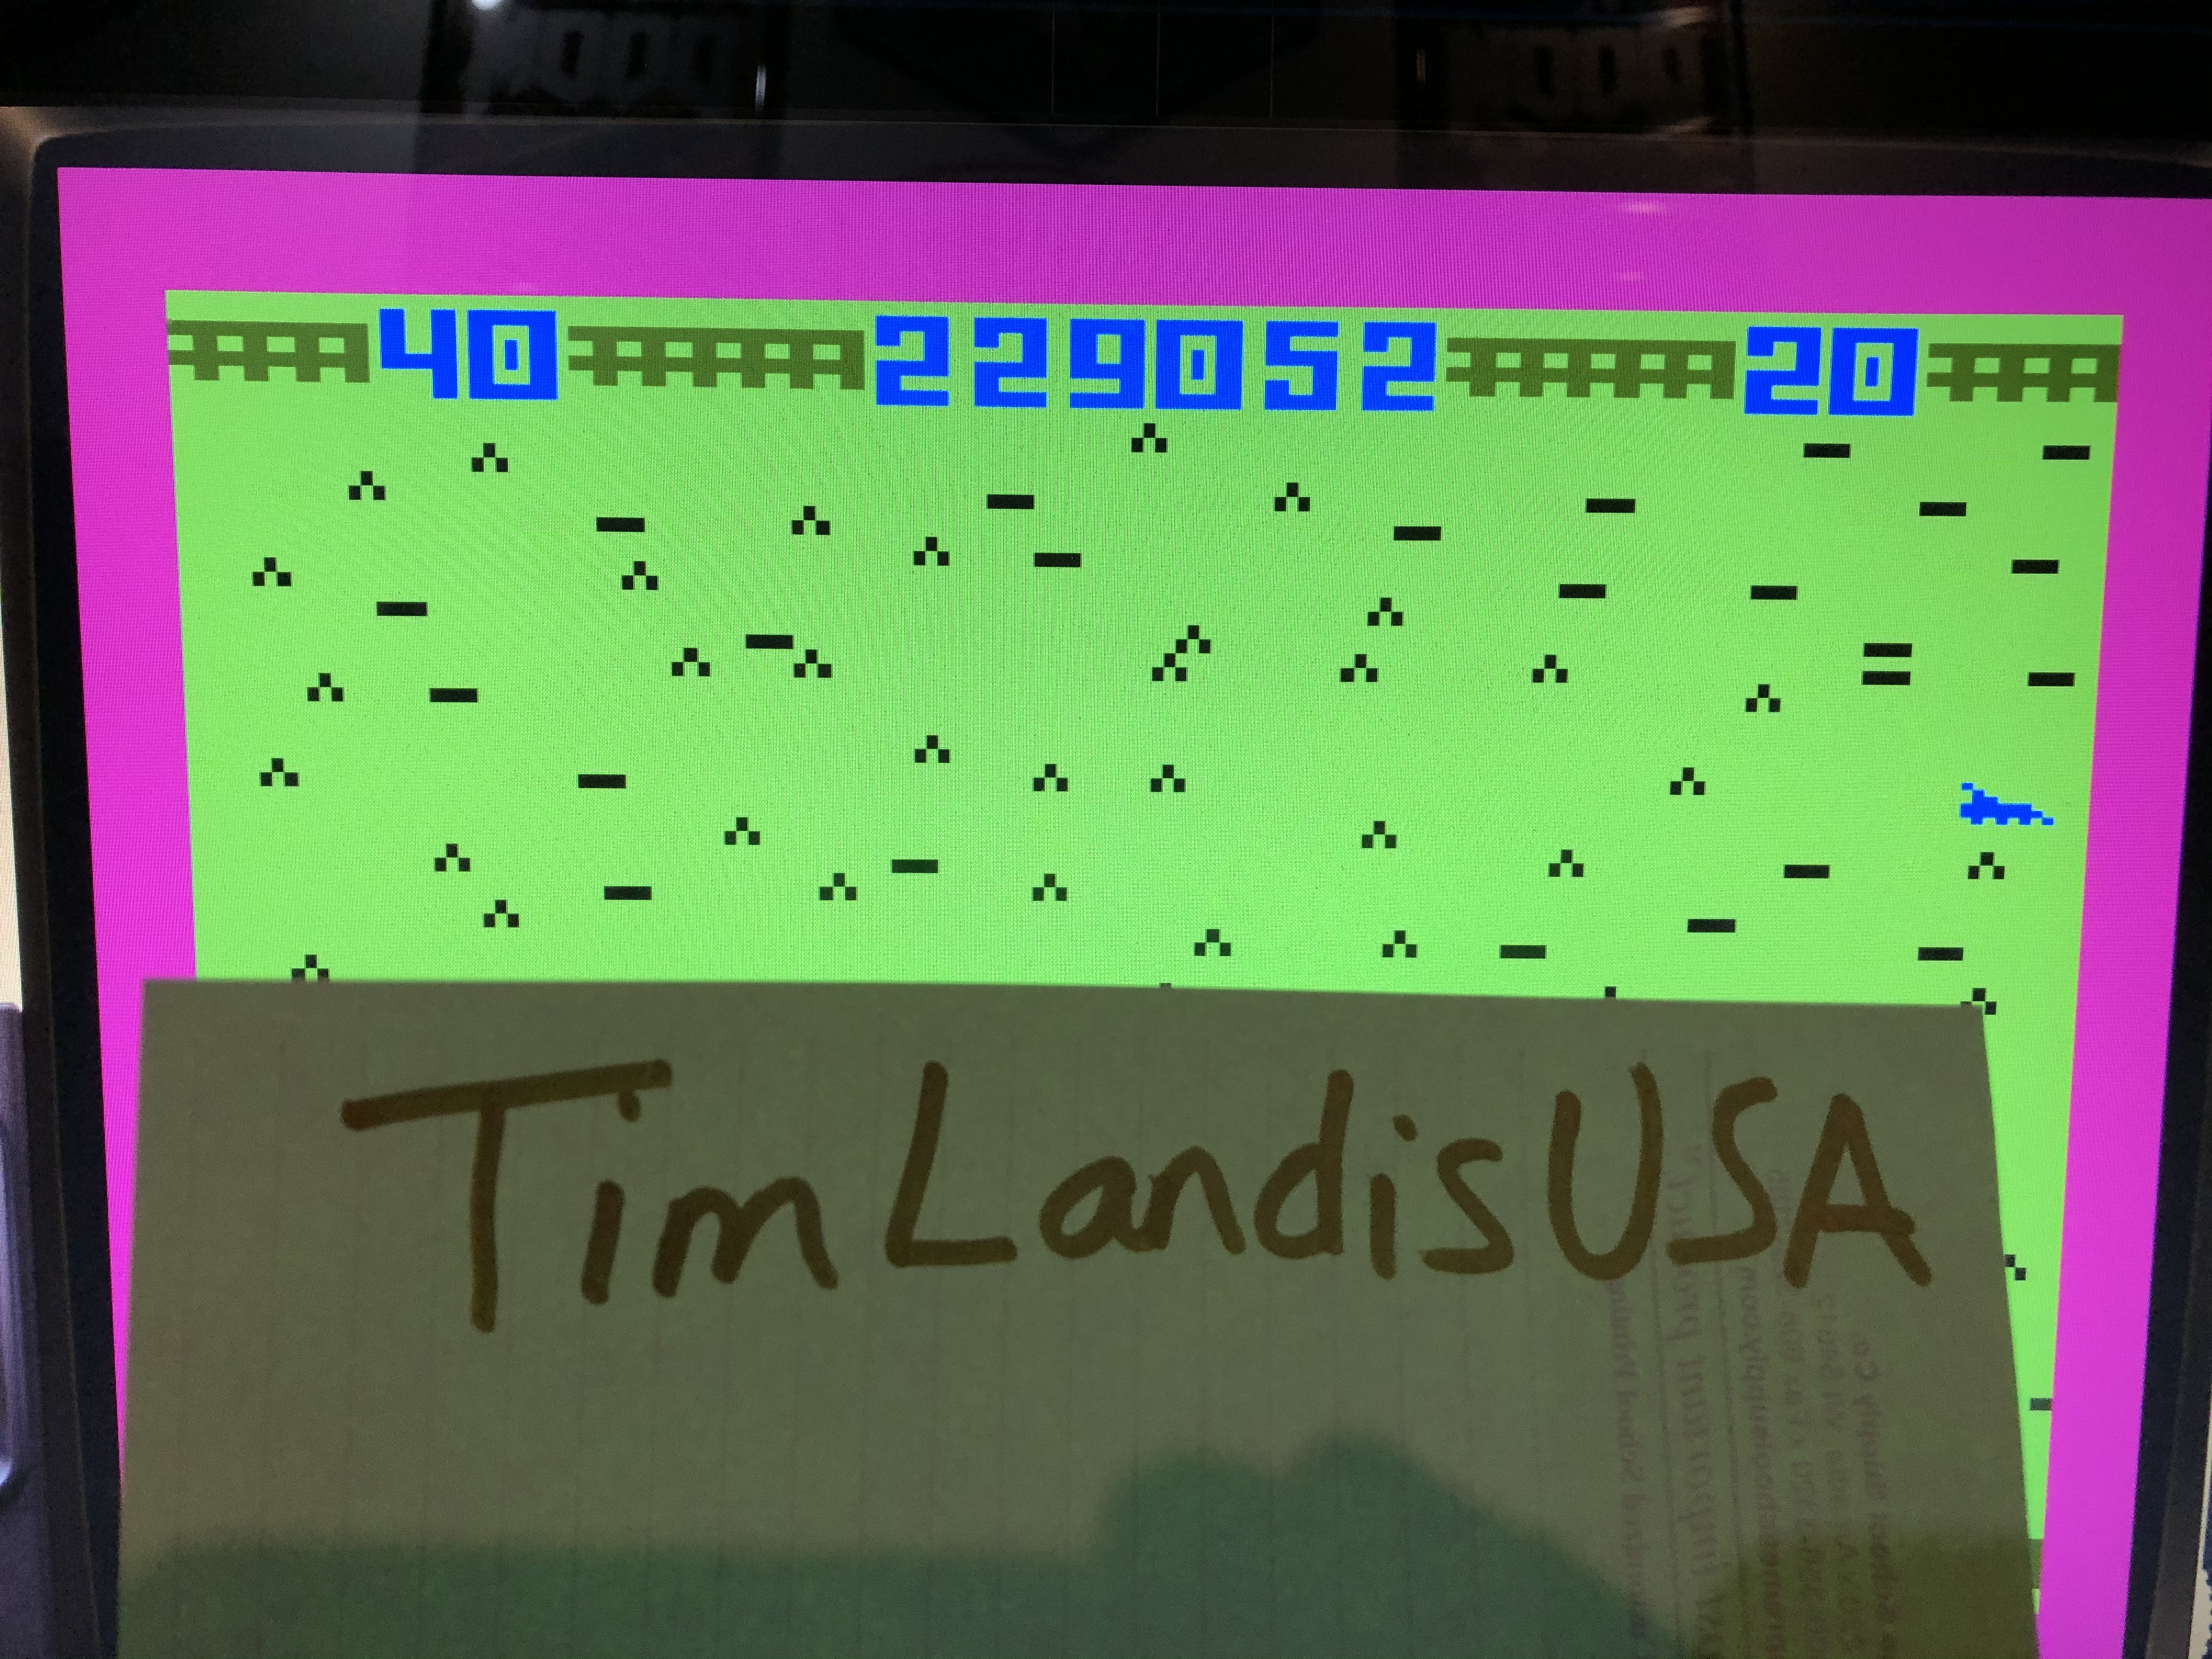 TimLandisUSA: Worm Whomper (Intellivision Emulated) 229,052 points on 2021-01-26 20:20:05